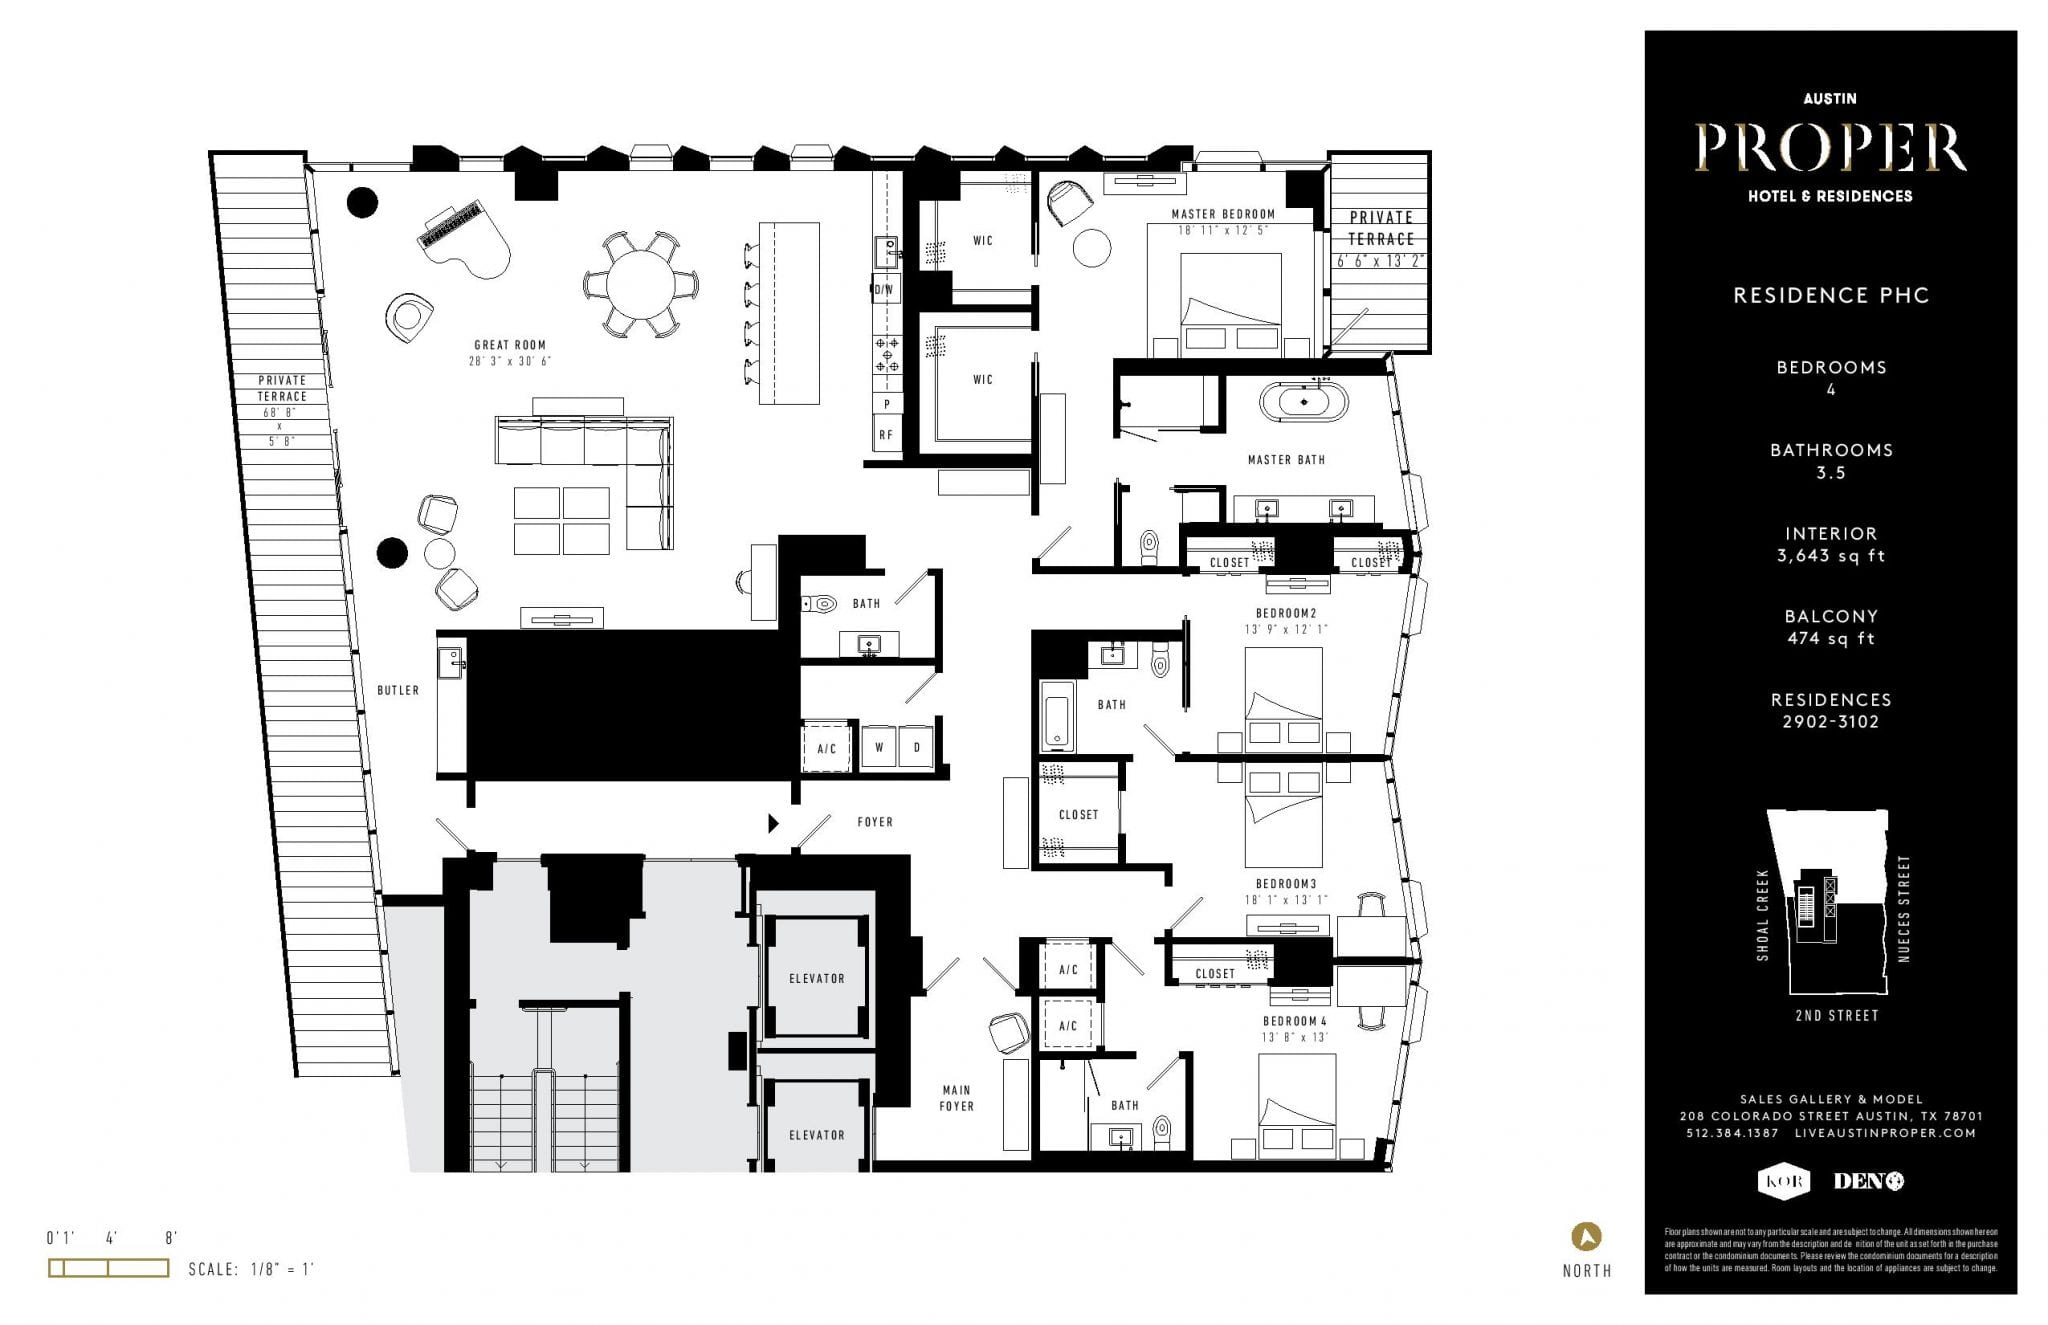 Condo Floor Plans, Downtown Austin, TX